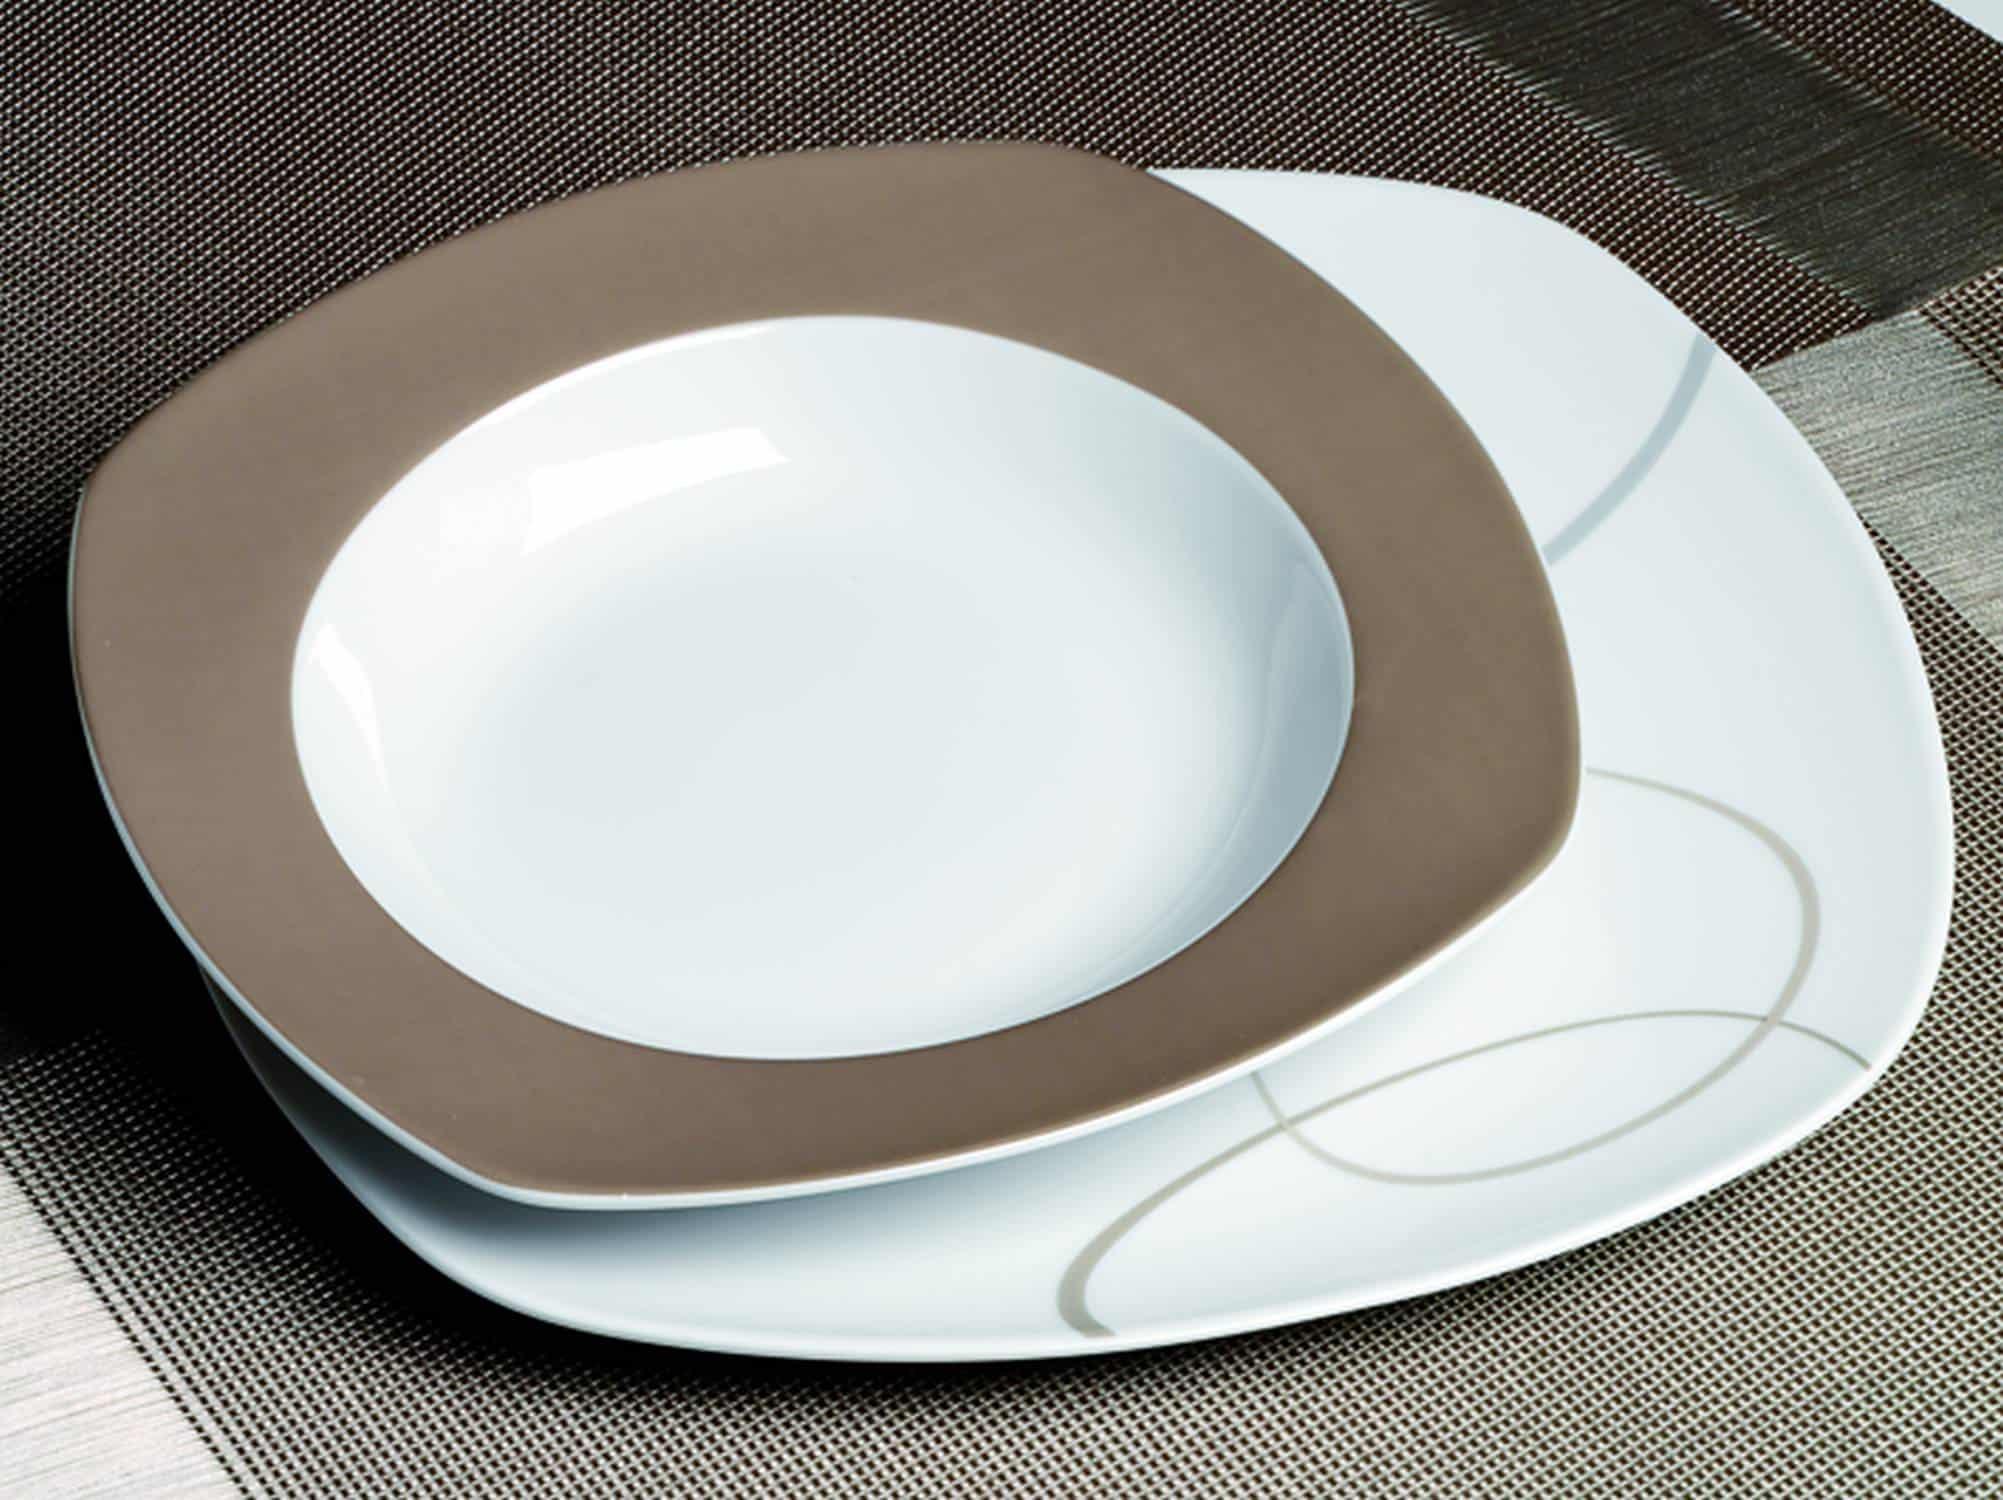 ritzenhoff breker tafelservice flirt porzellan serie. Black Bedroom Furniture Sets. Home Design Ideas